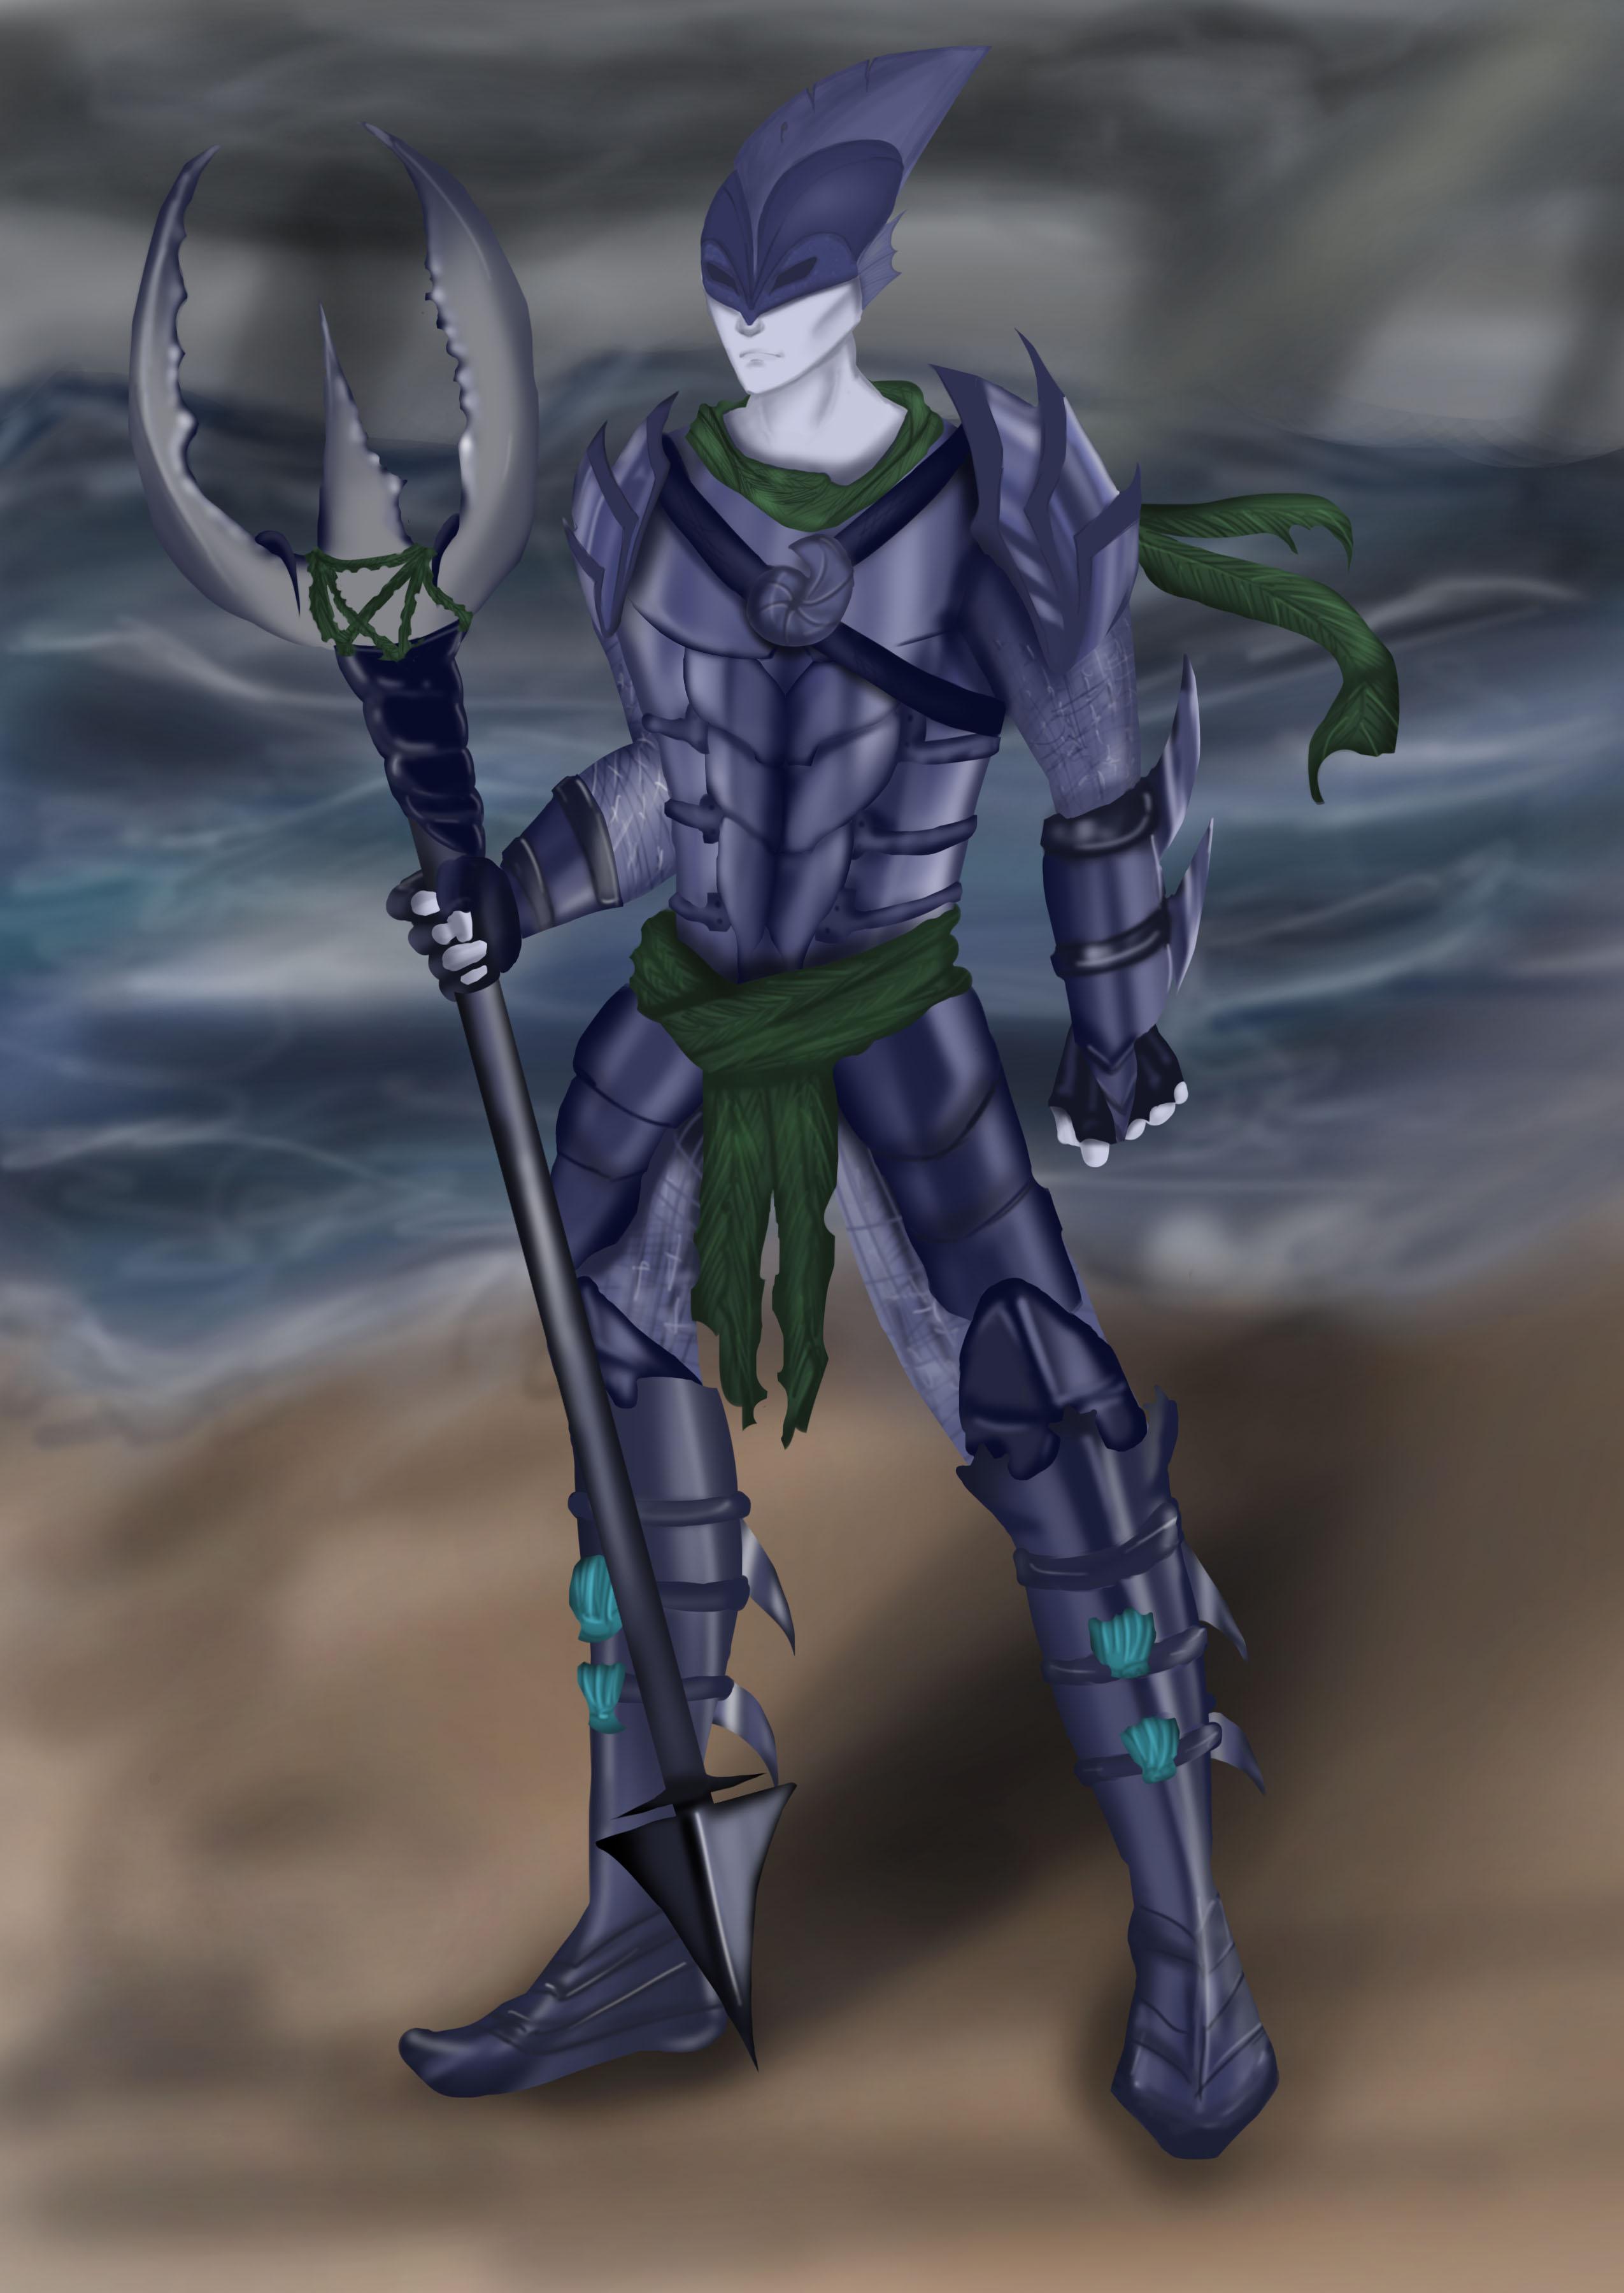 Yee_Alyssa Knight Character